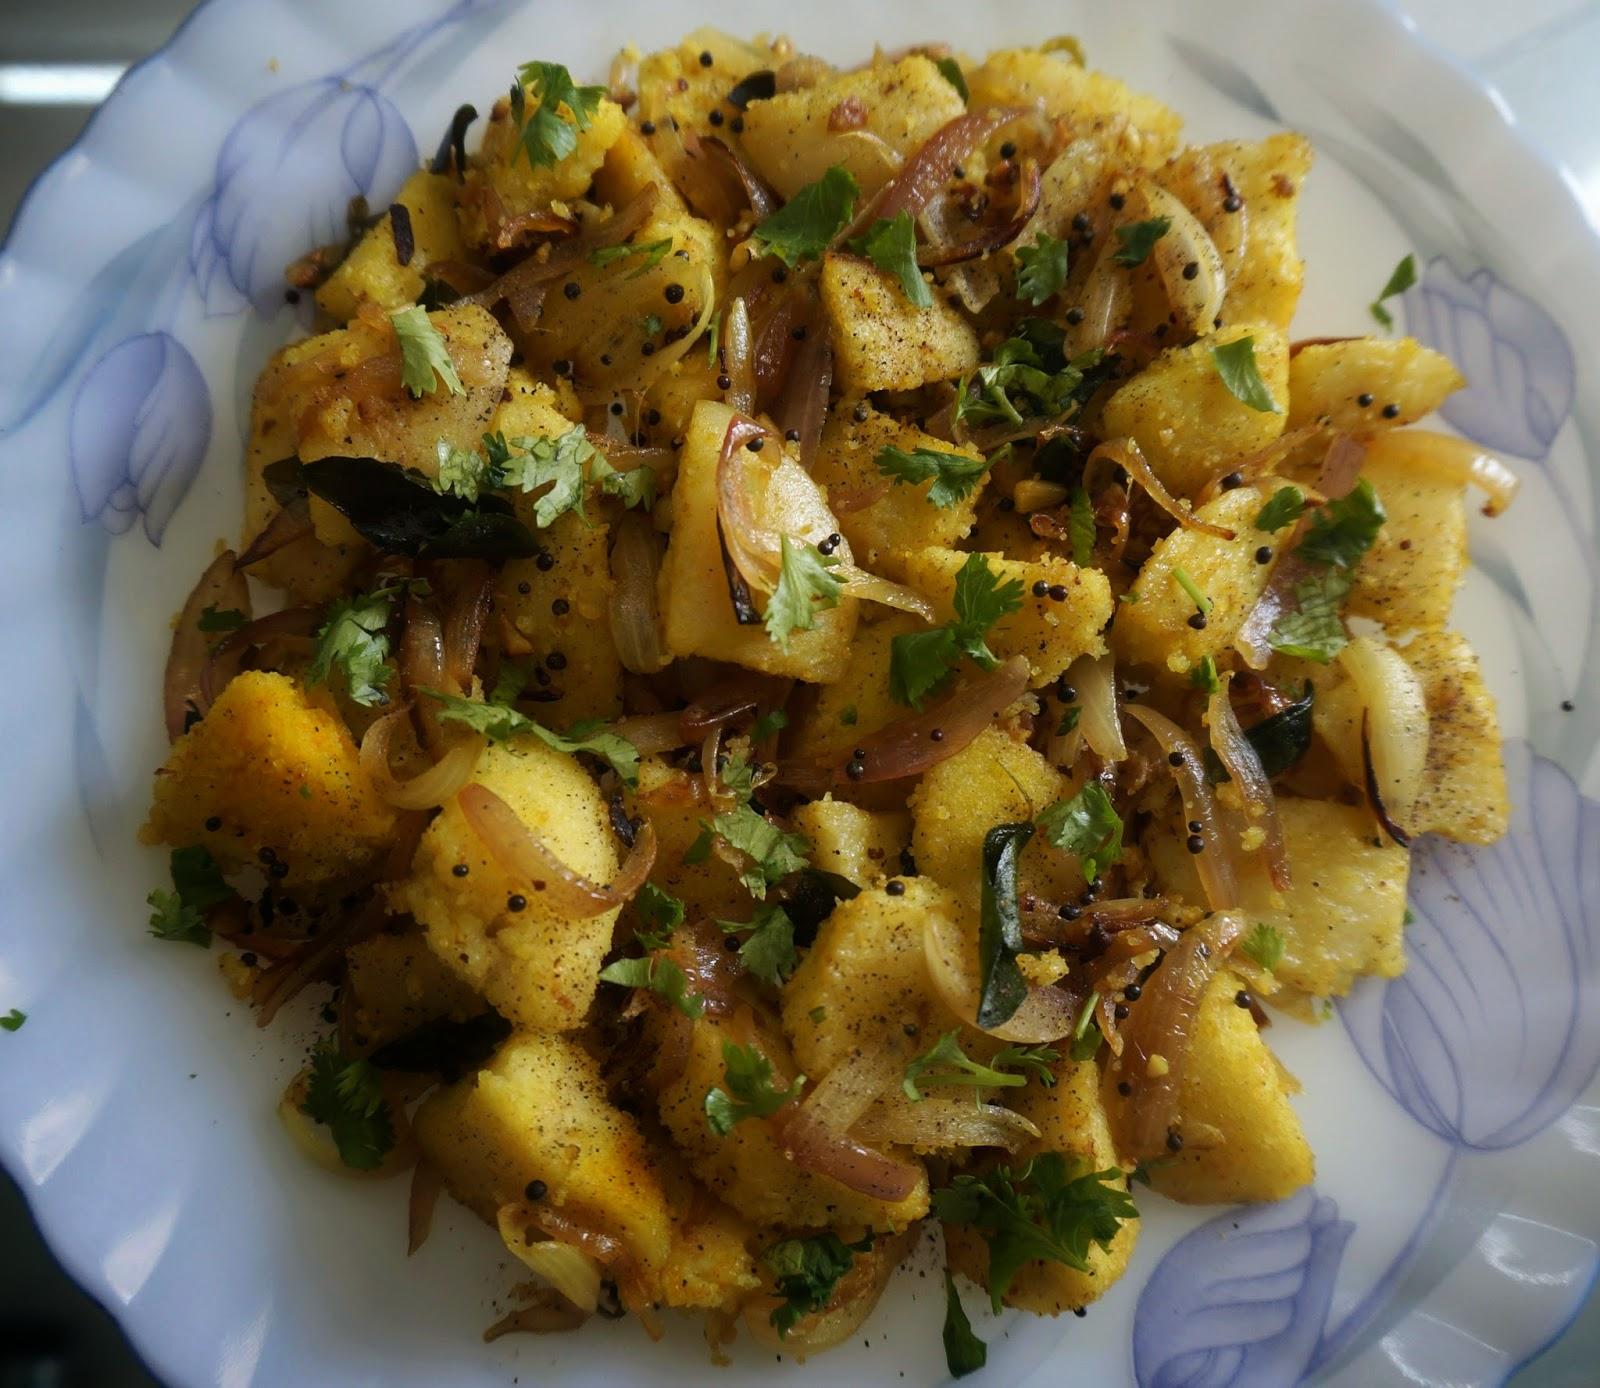 Masala Idli, Poha idly, idly sambar, fried idly, chatpati idli, idli in new flavour